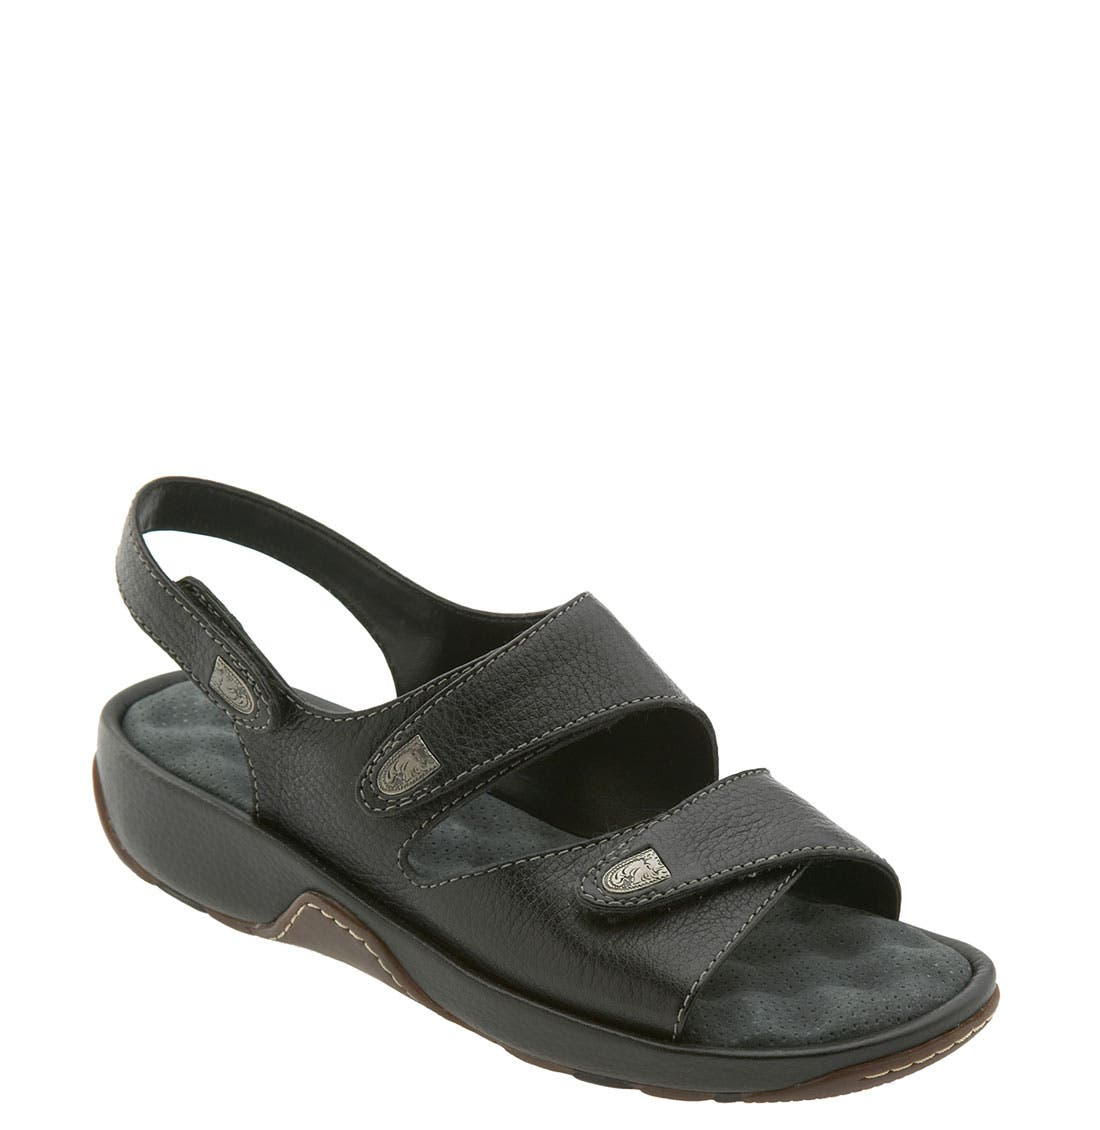 SoftWalk® 'Bolivia' Sandal